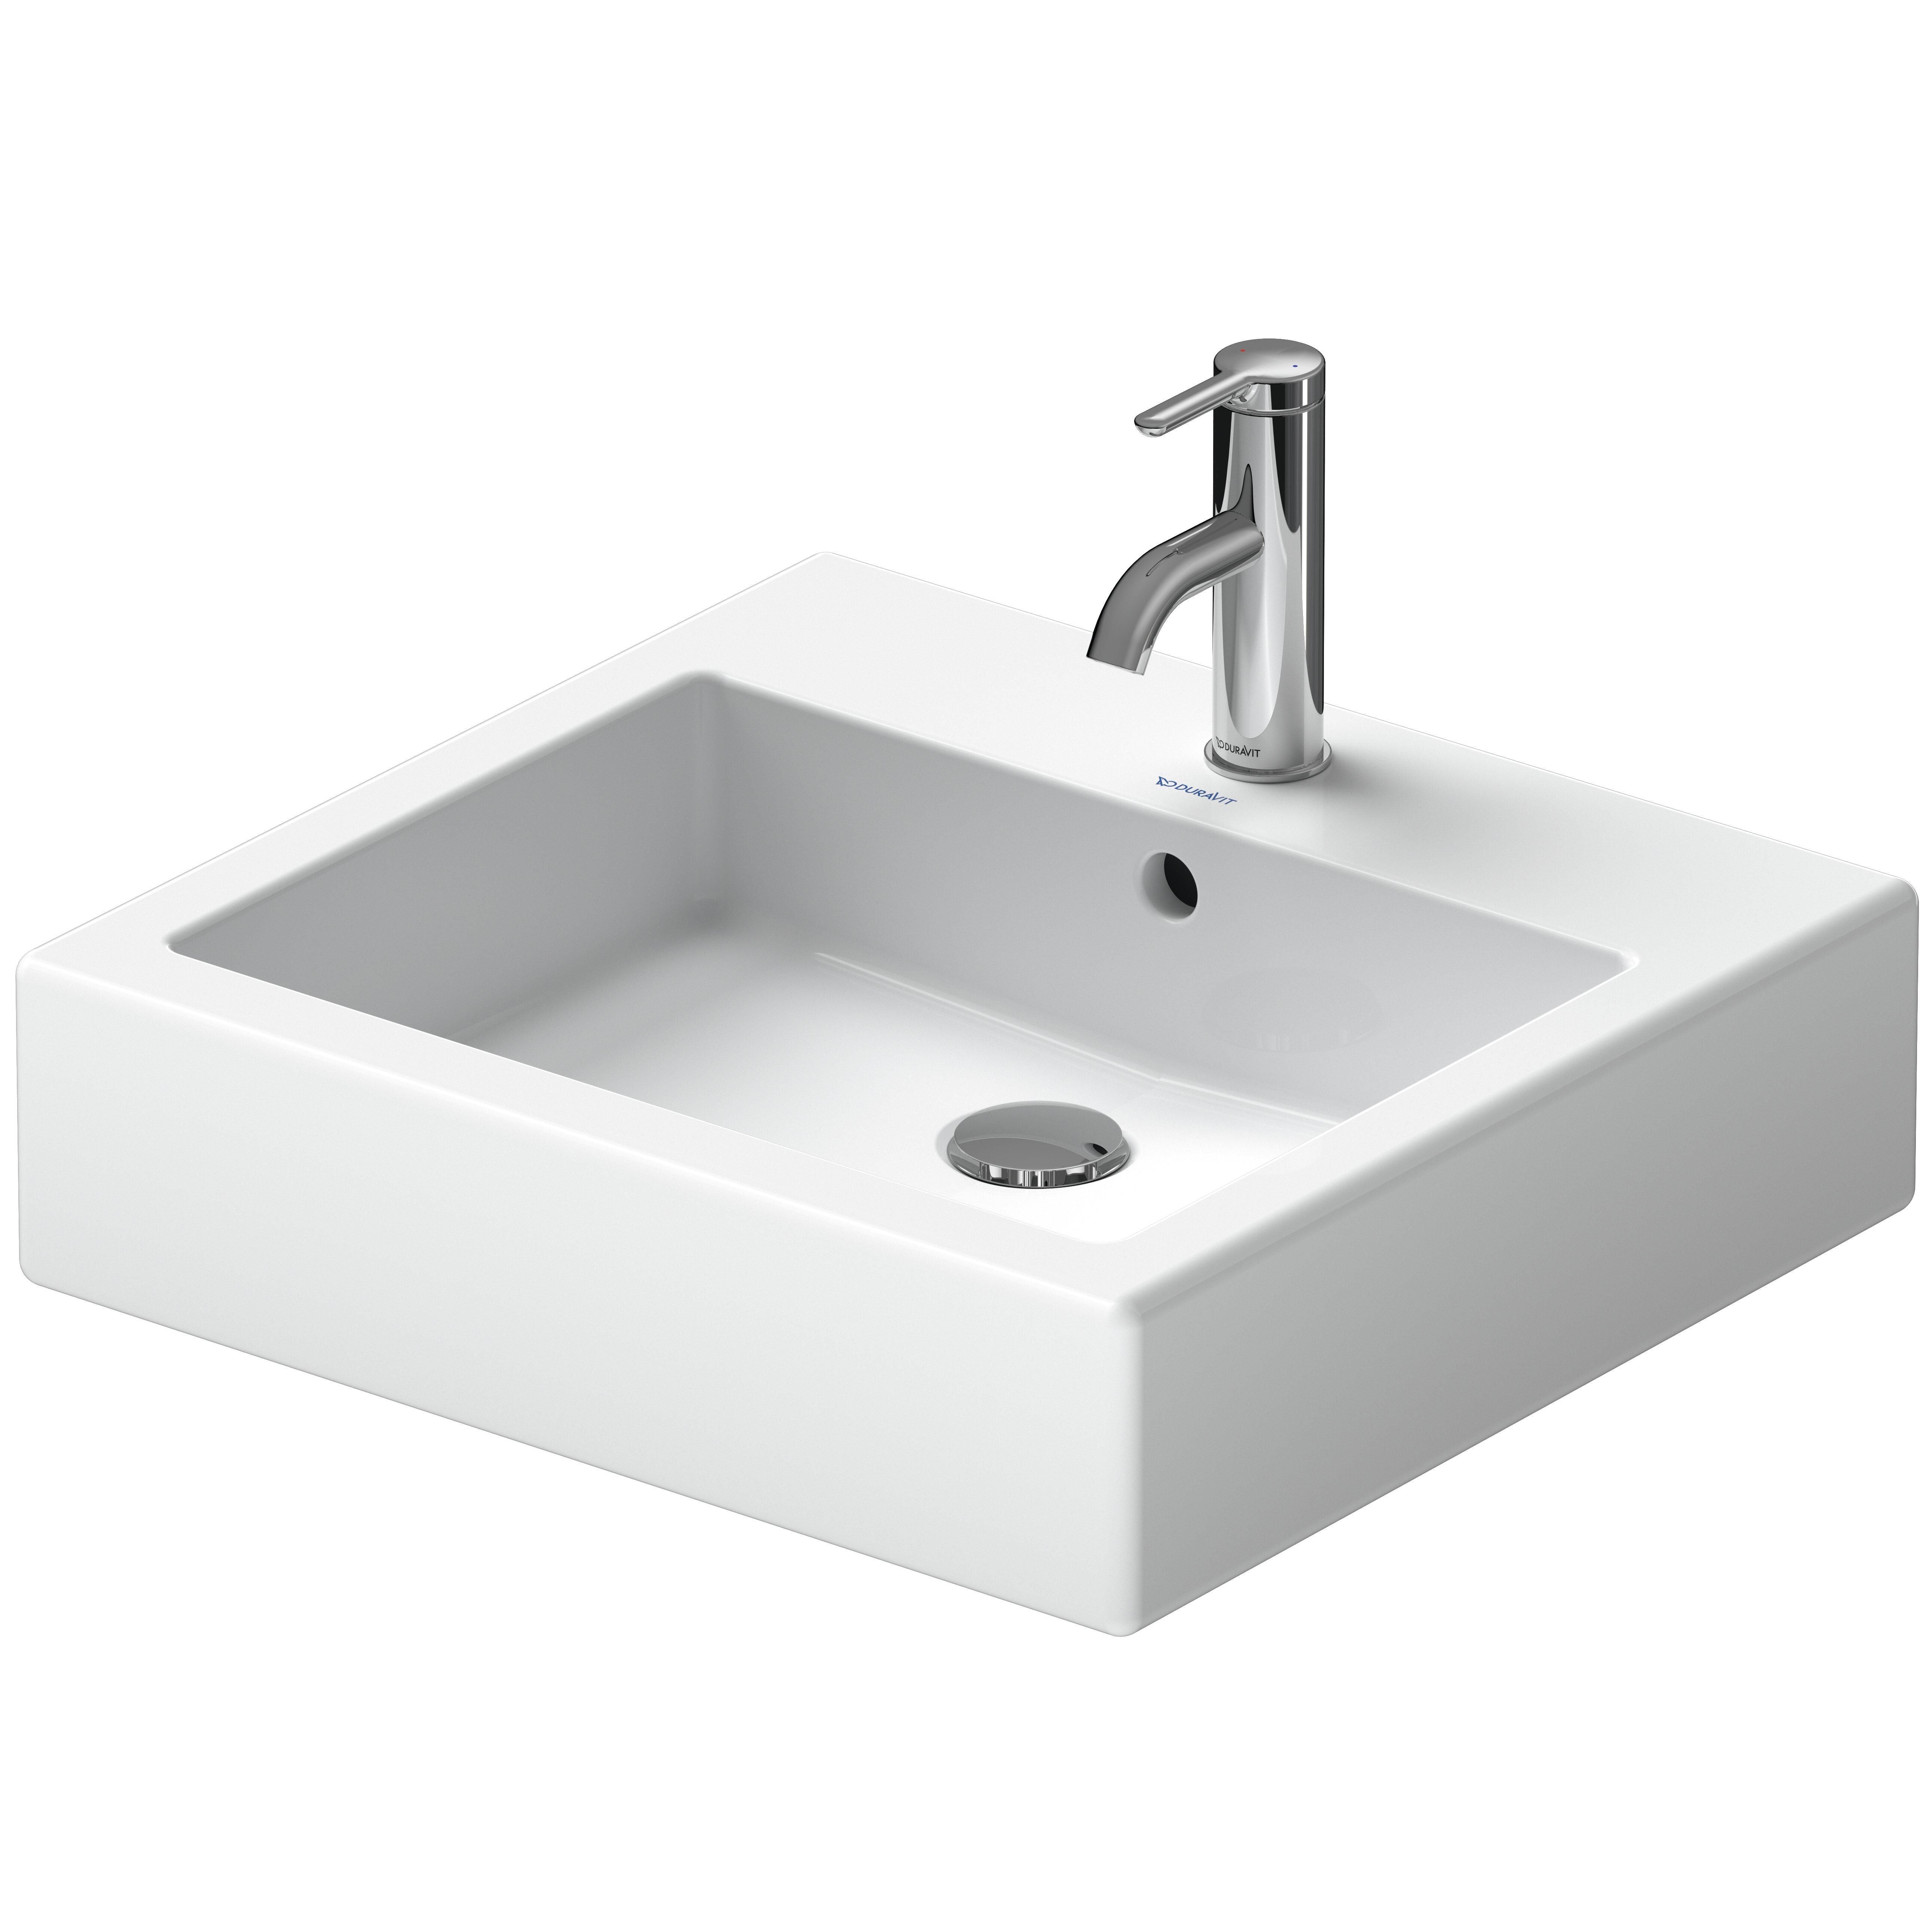 Vero White Ceramic Rectangular Vessel Bathroom Sink with Overflow